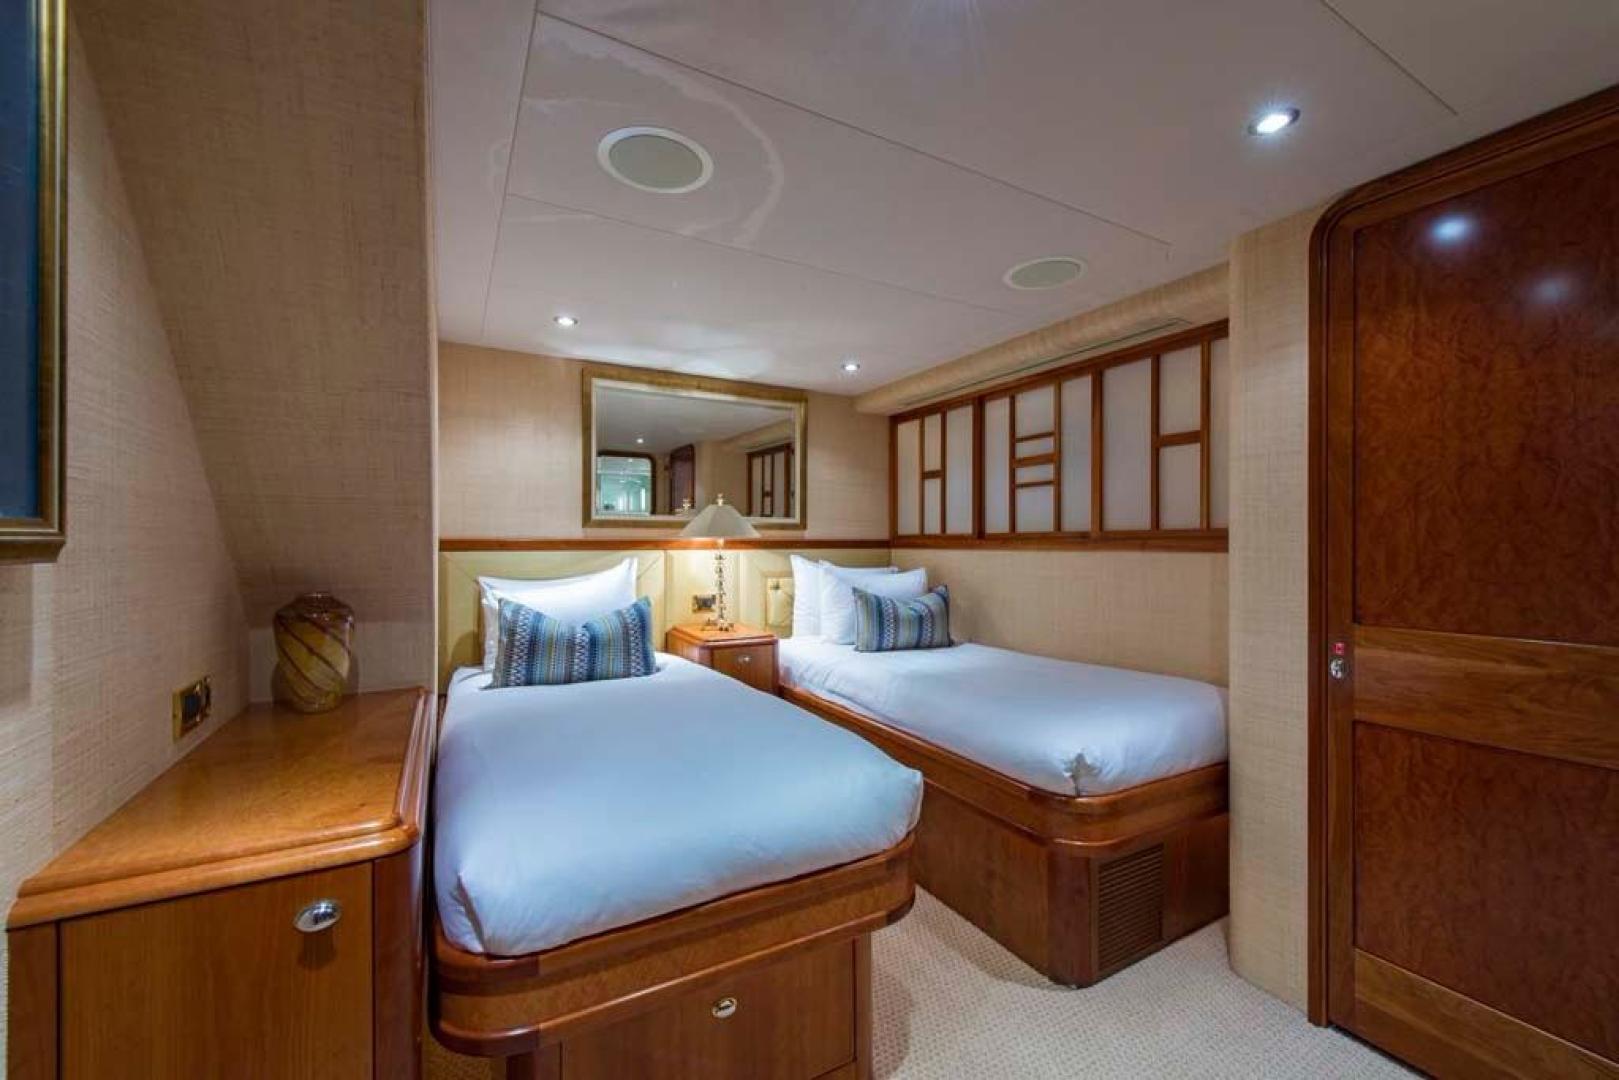 Westport-Tri-Deck 2003-Vision Jupiter-Florida-United States-Starboard Guest Statroom-370677 | Thumbnail